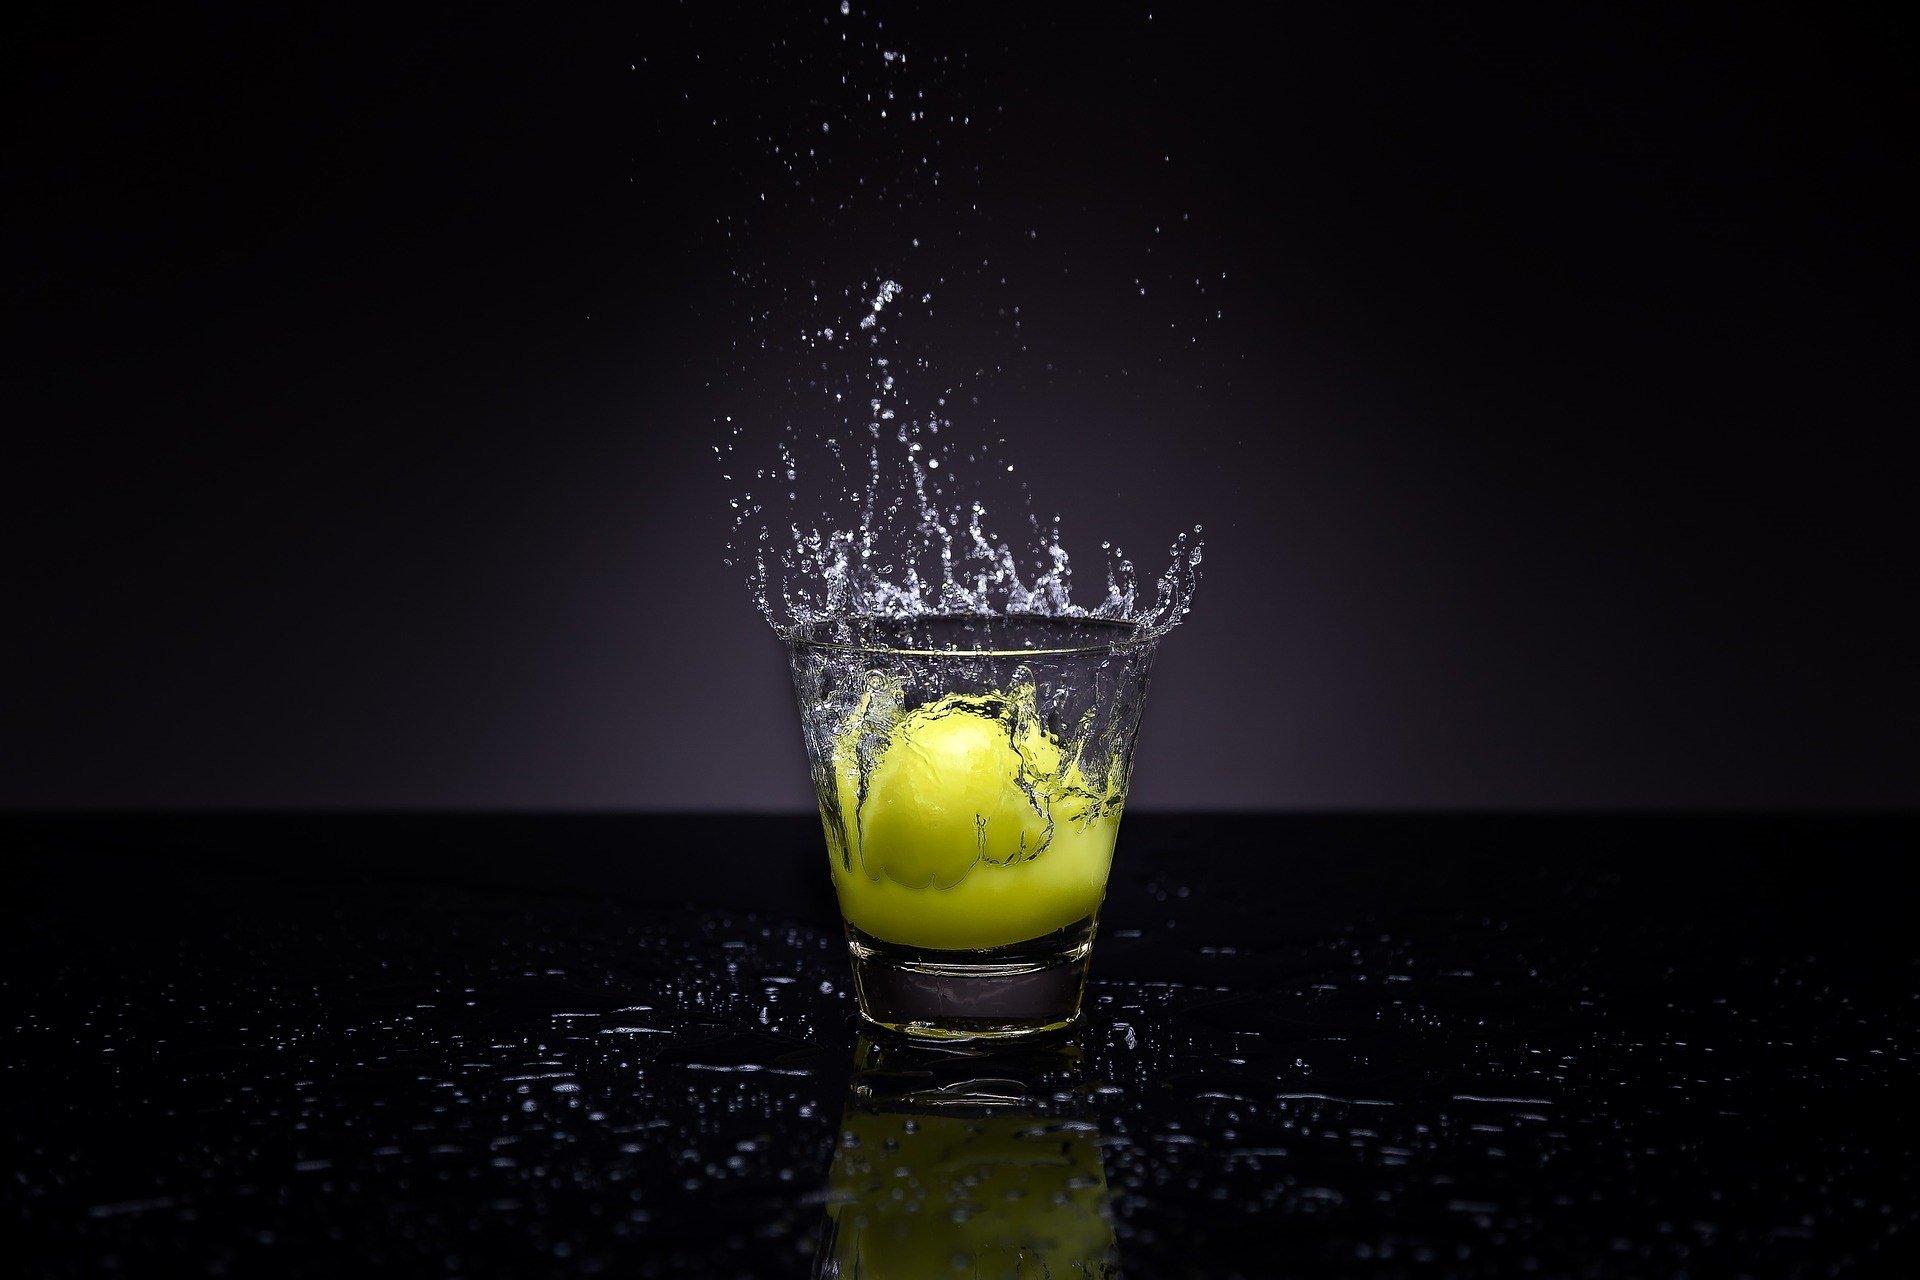 Sip water regularly